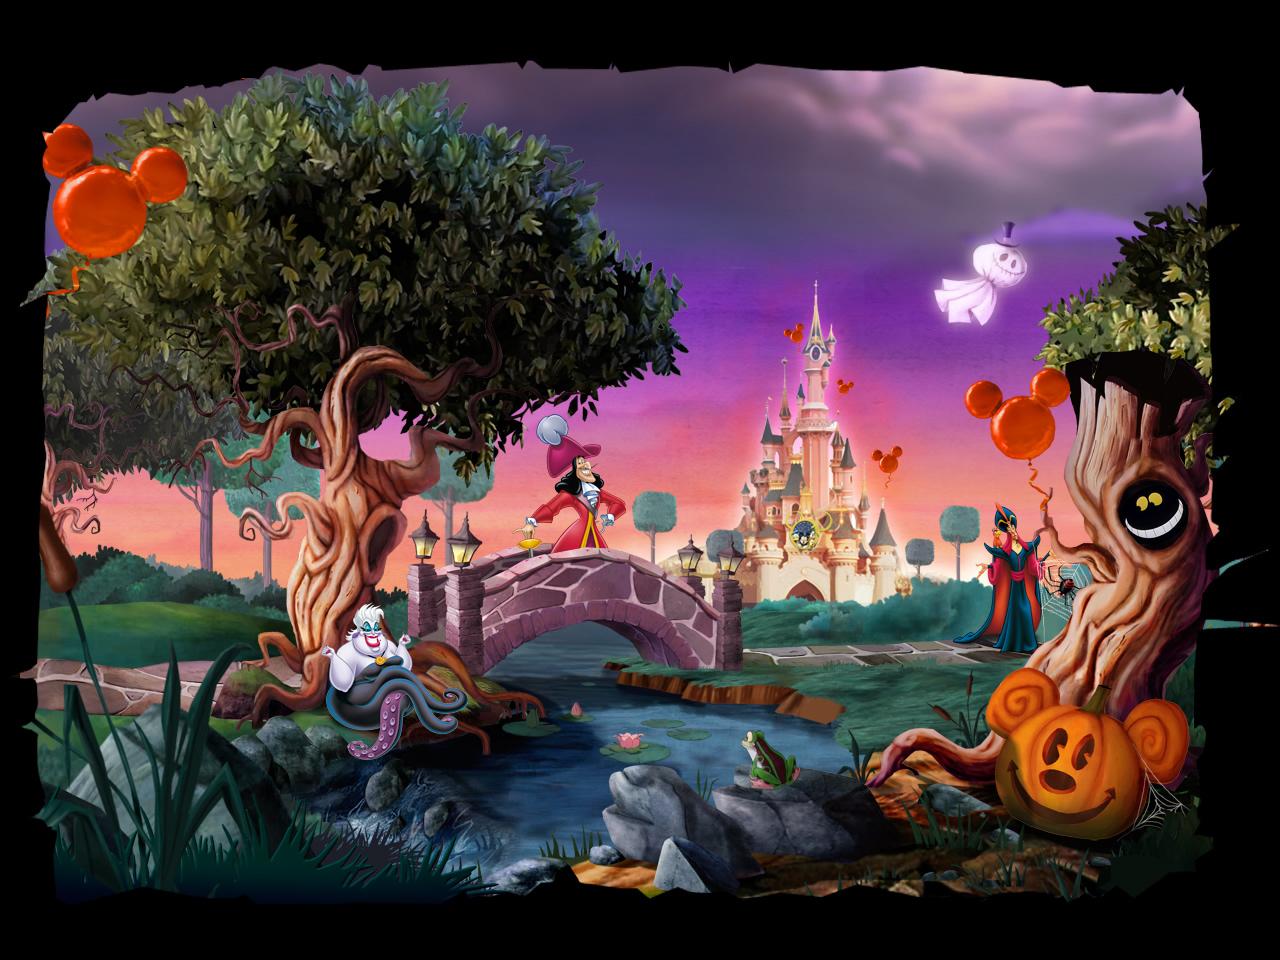 Fondos De Pantalla De Disney: Disney Halloween Wallpapers, Disney En Halloween